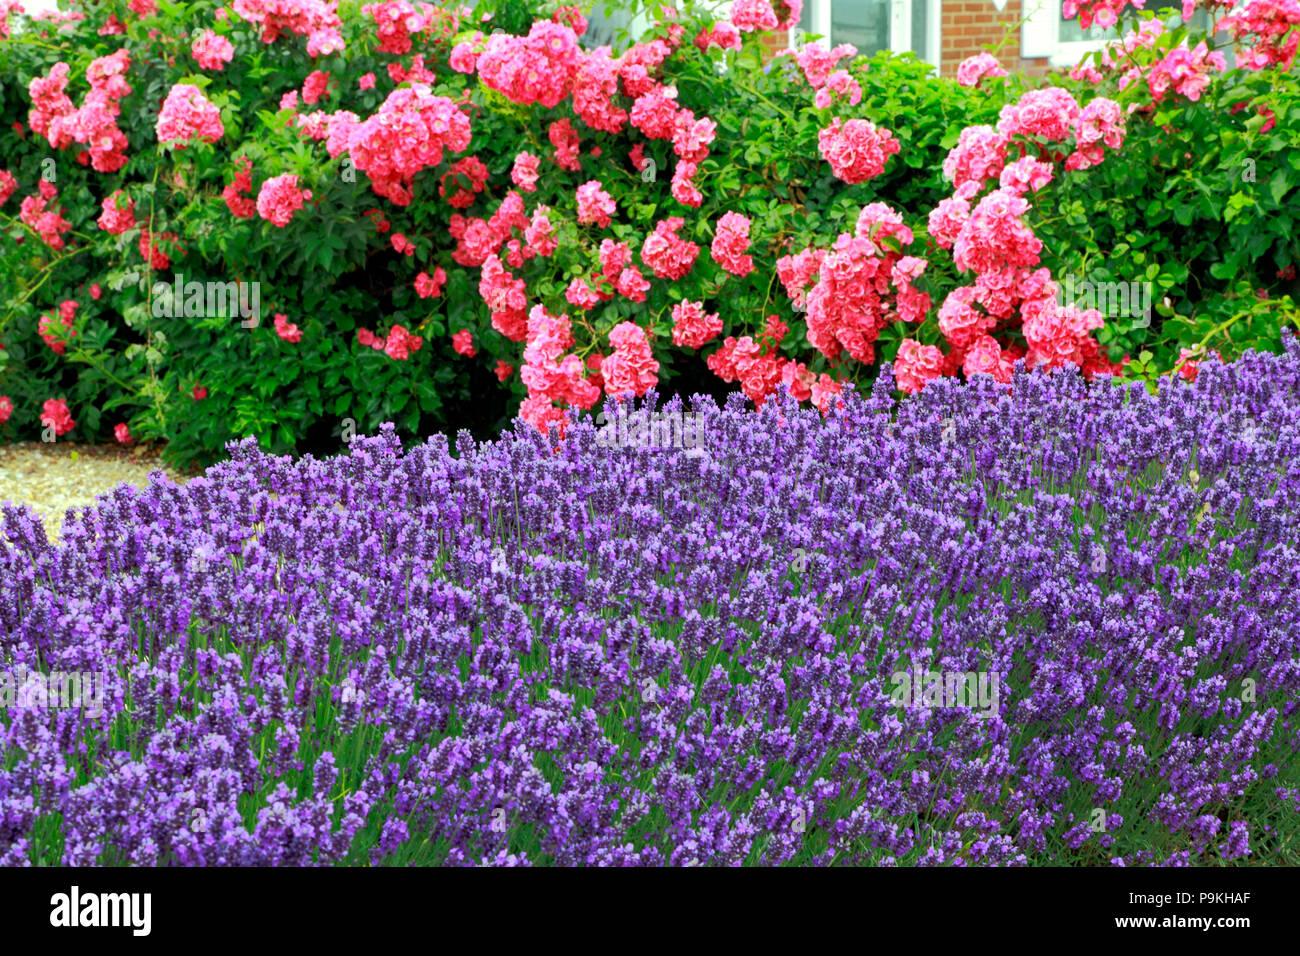 Bleu, Violet, lavande, Roses, jardin de devant, mur, Lavandula, Rosa Photo Stock